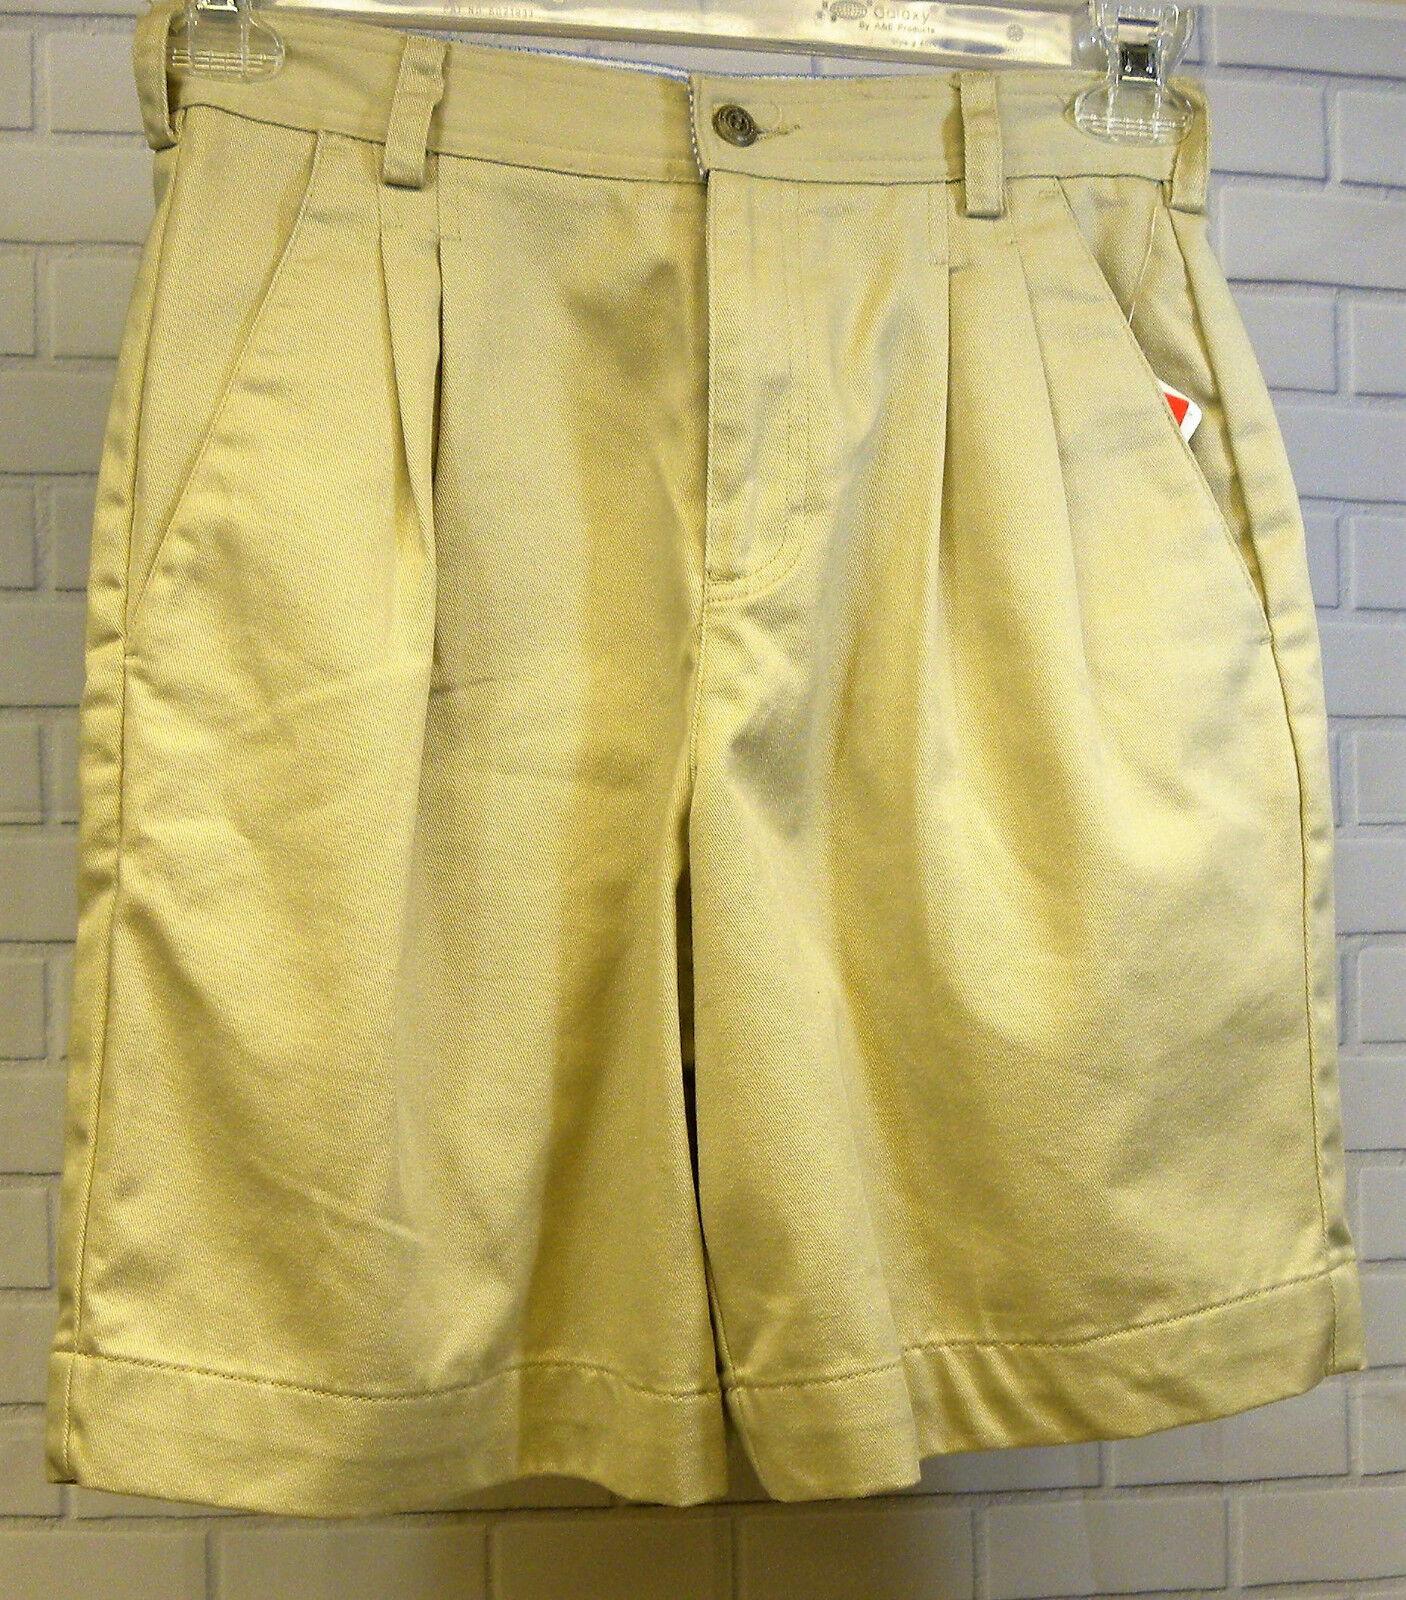 Liz Claiborne Khaki Shorts Size 4 Cotton Pleat Front Walking Casual New